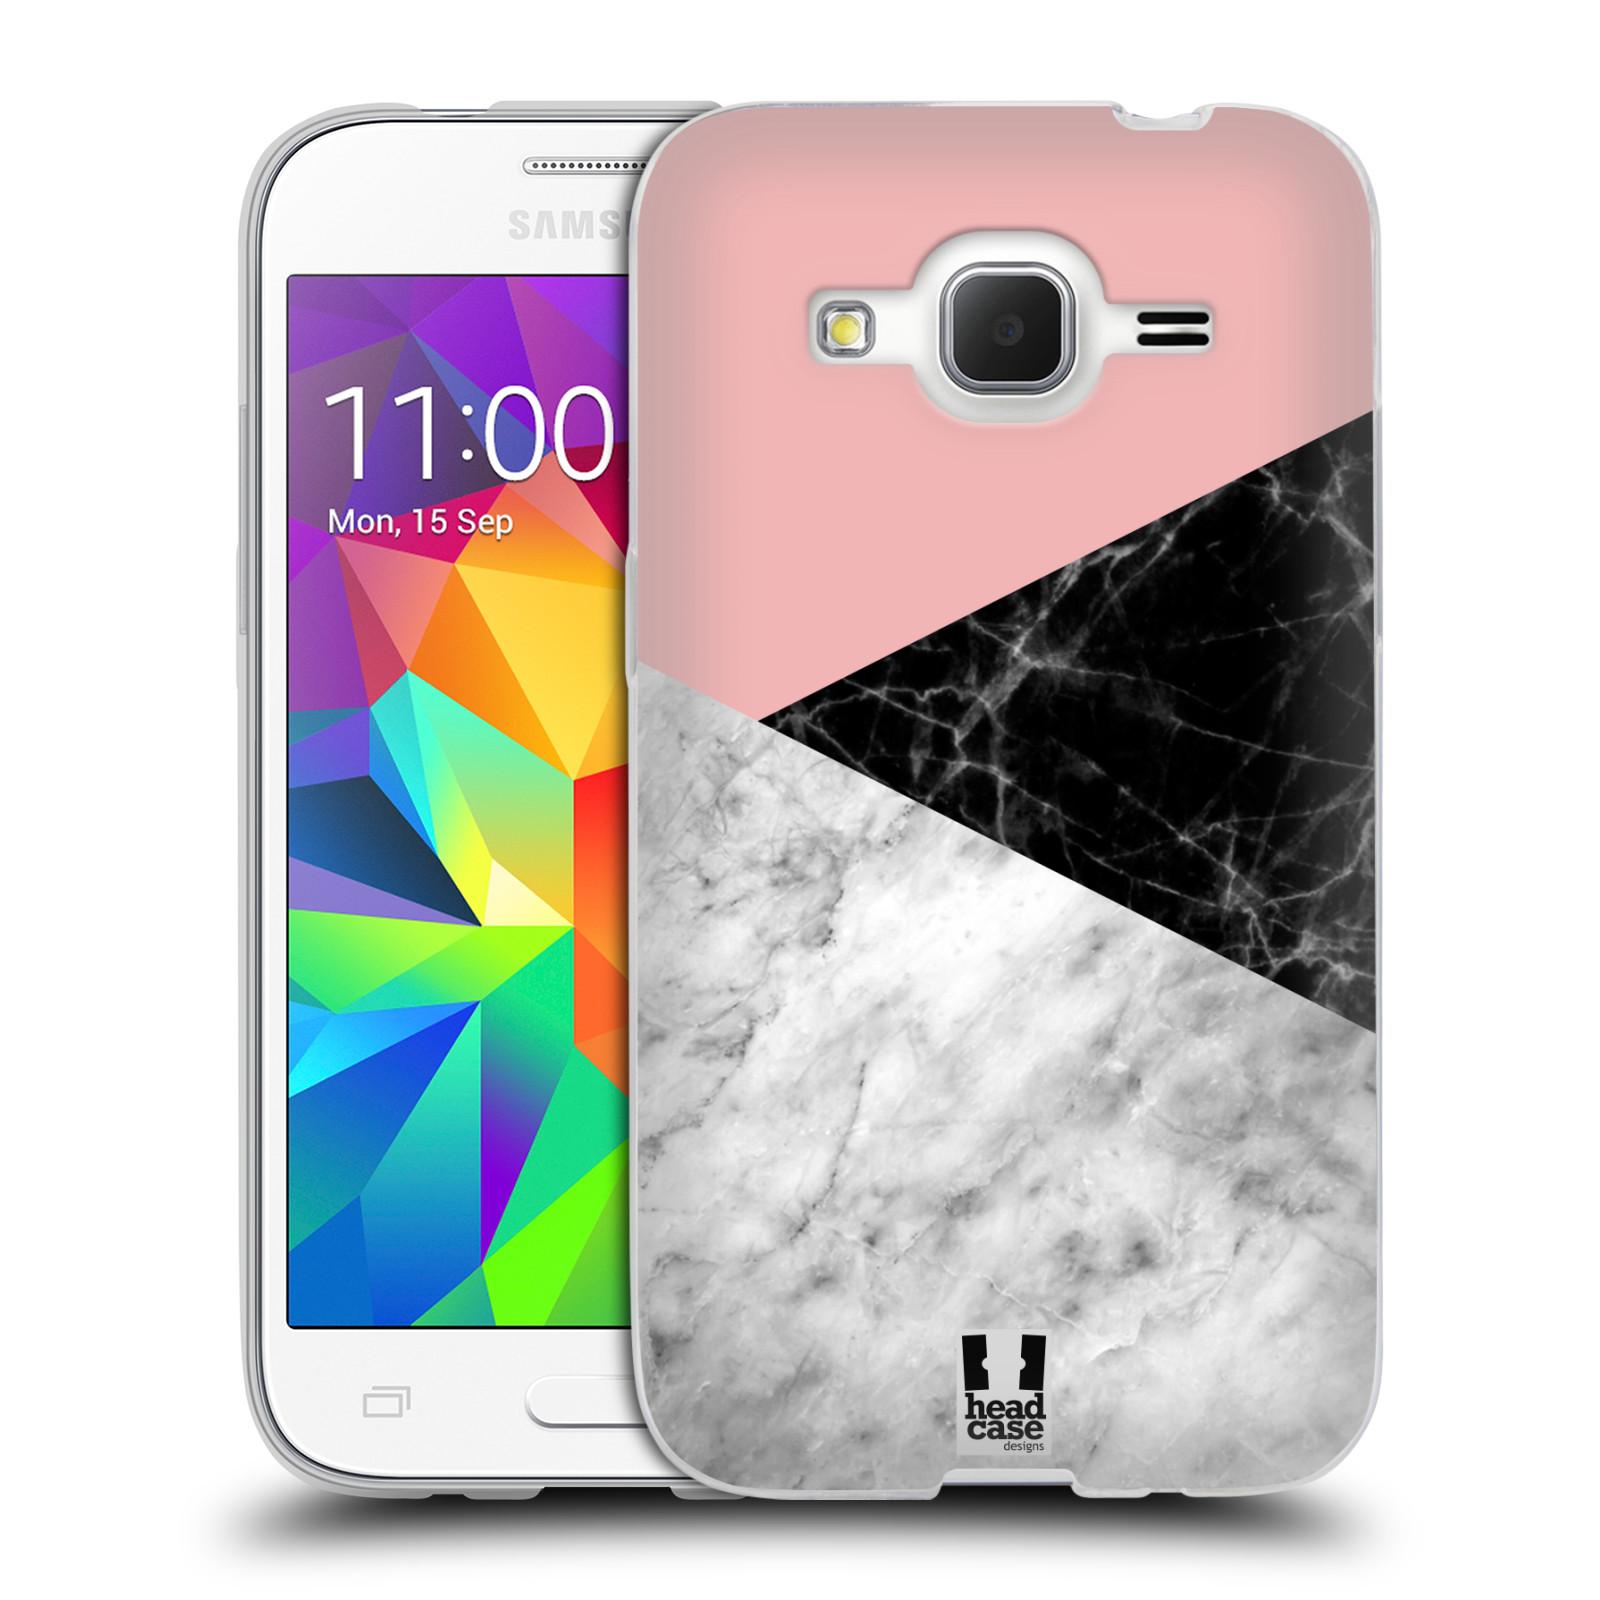 Silikonové pouzdro na mobil Samsung Galaxy Core Prime LTE - Head Case - Mramor mix